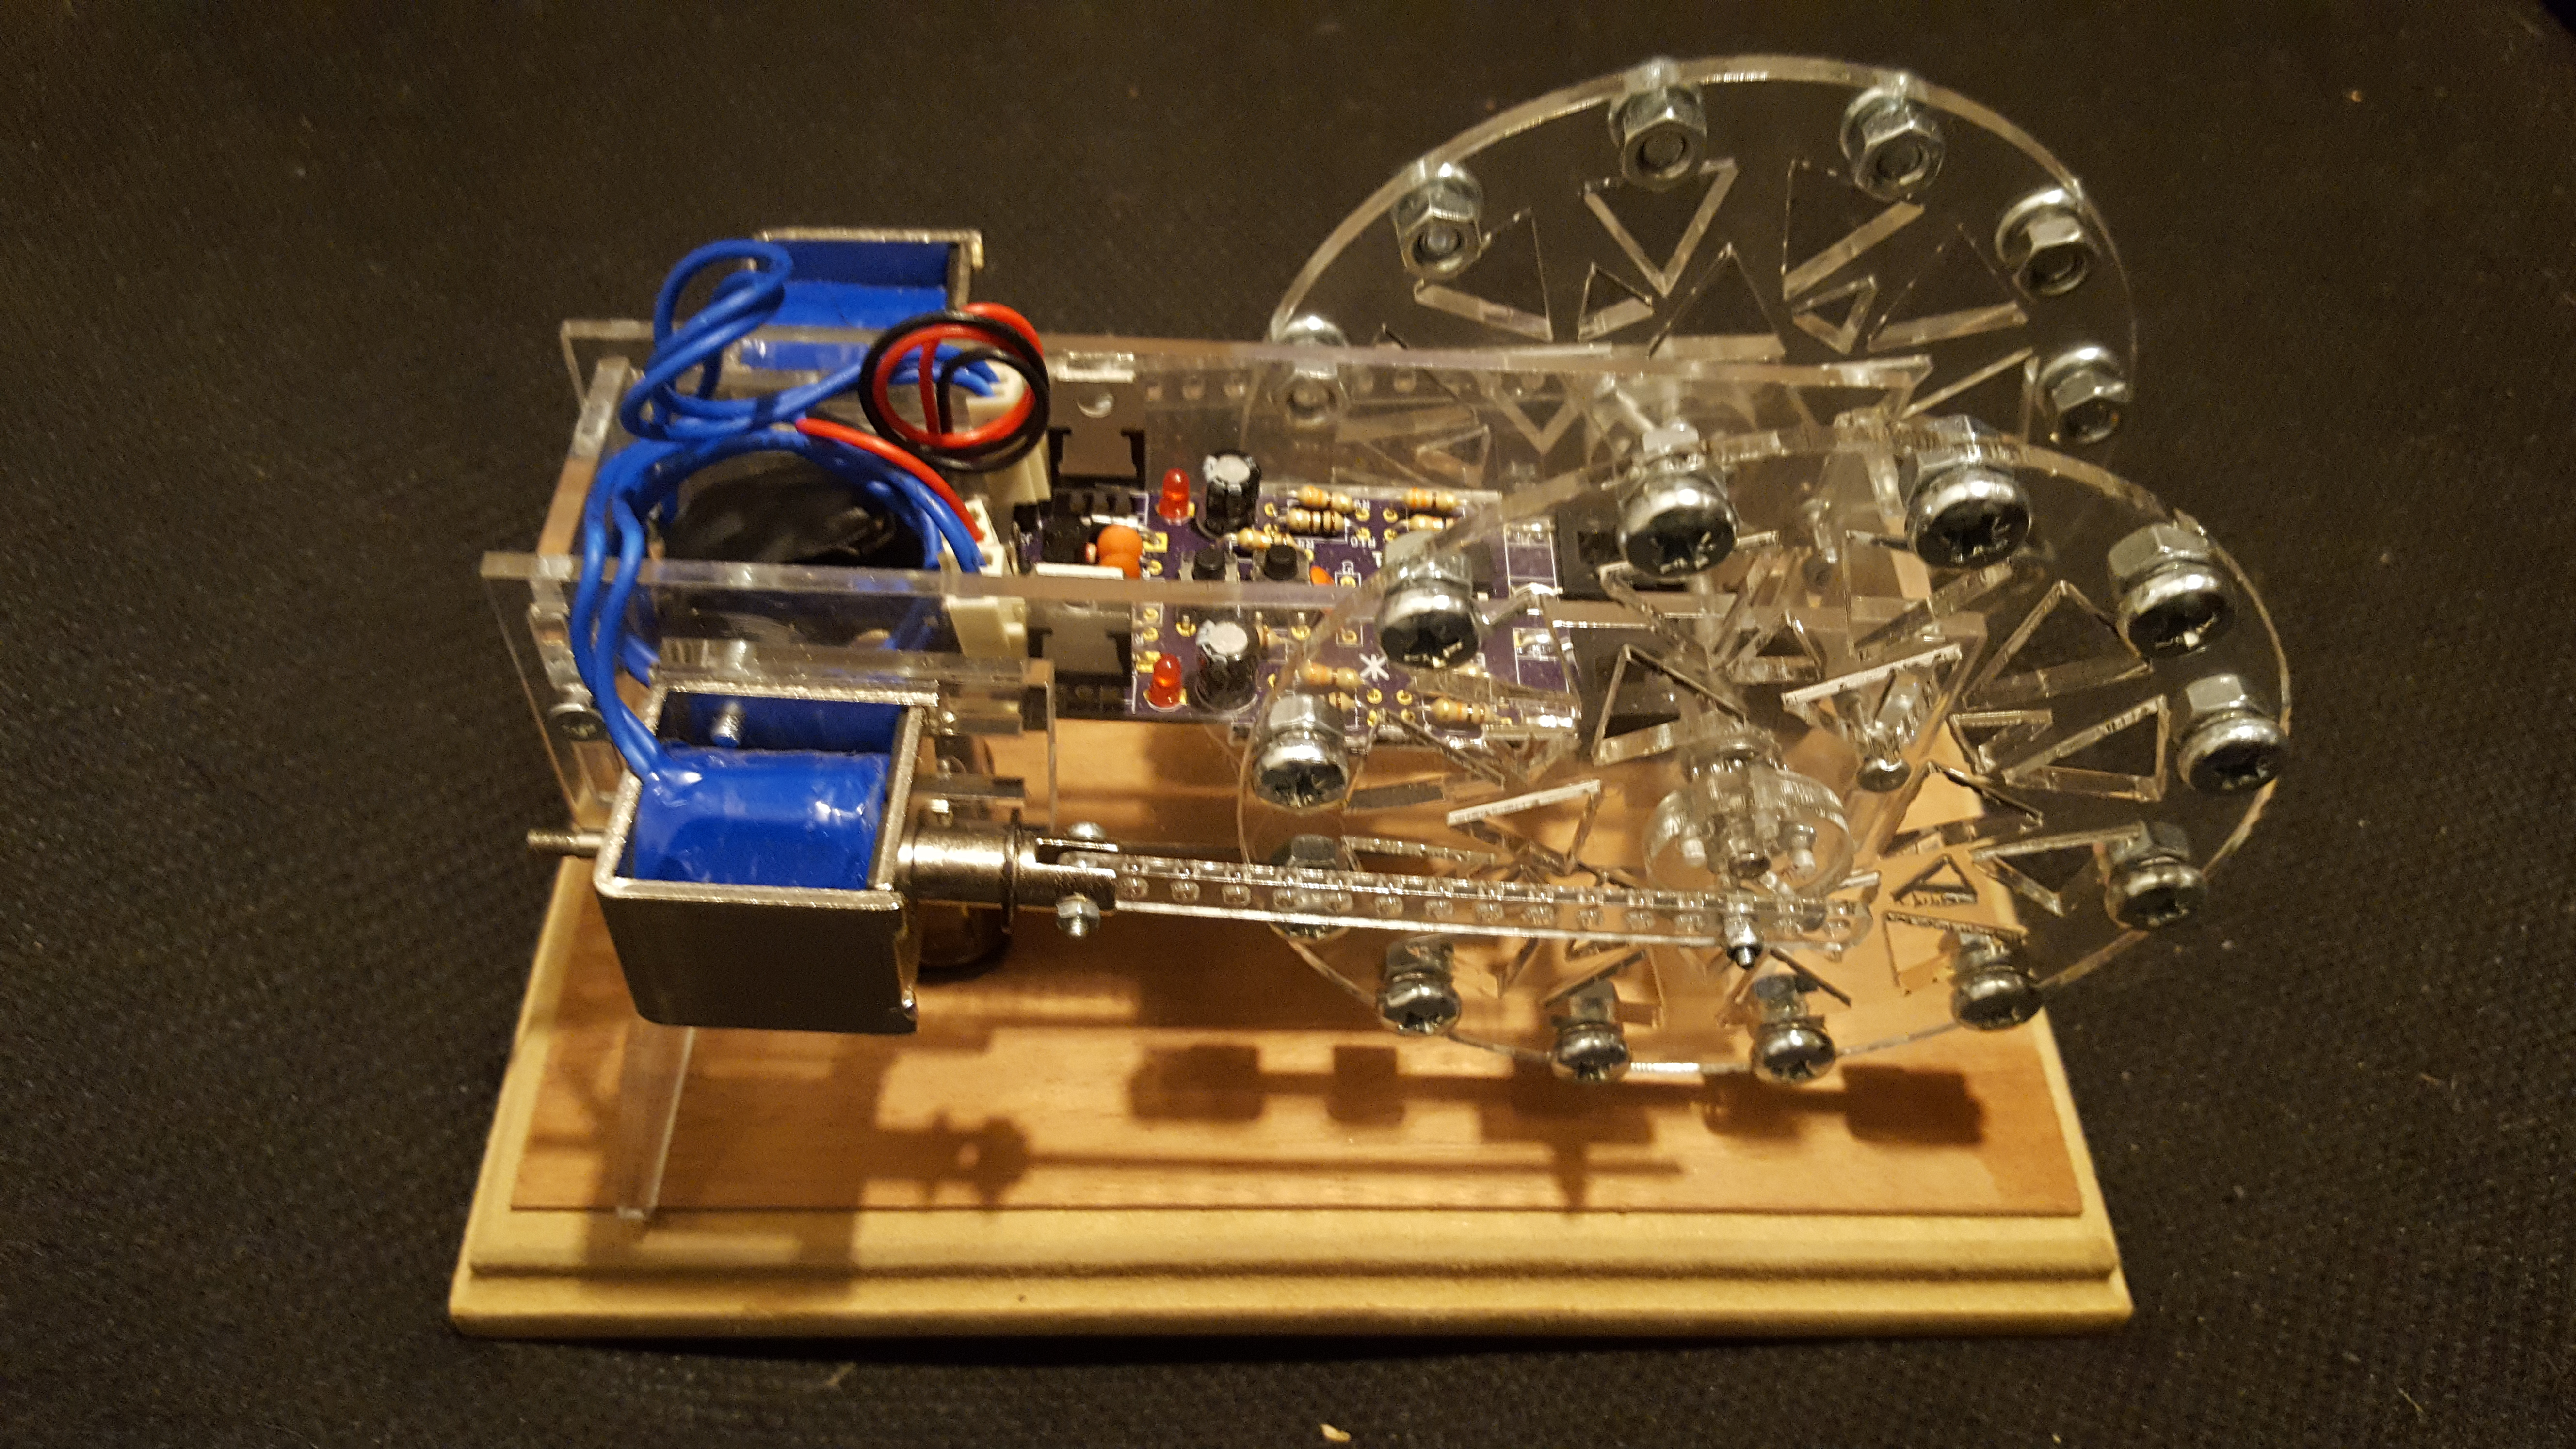 Solenoid Engine Twin Horizontal - More Power